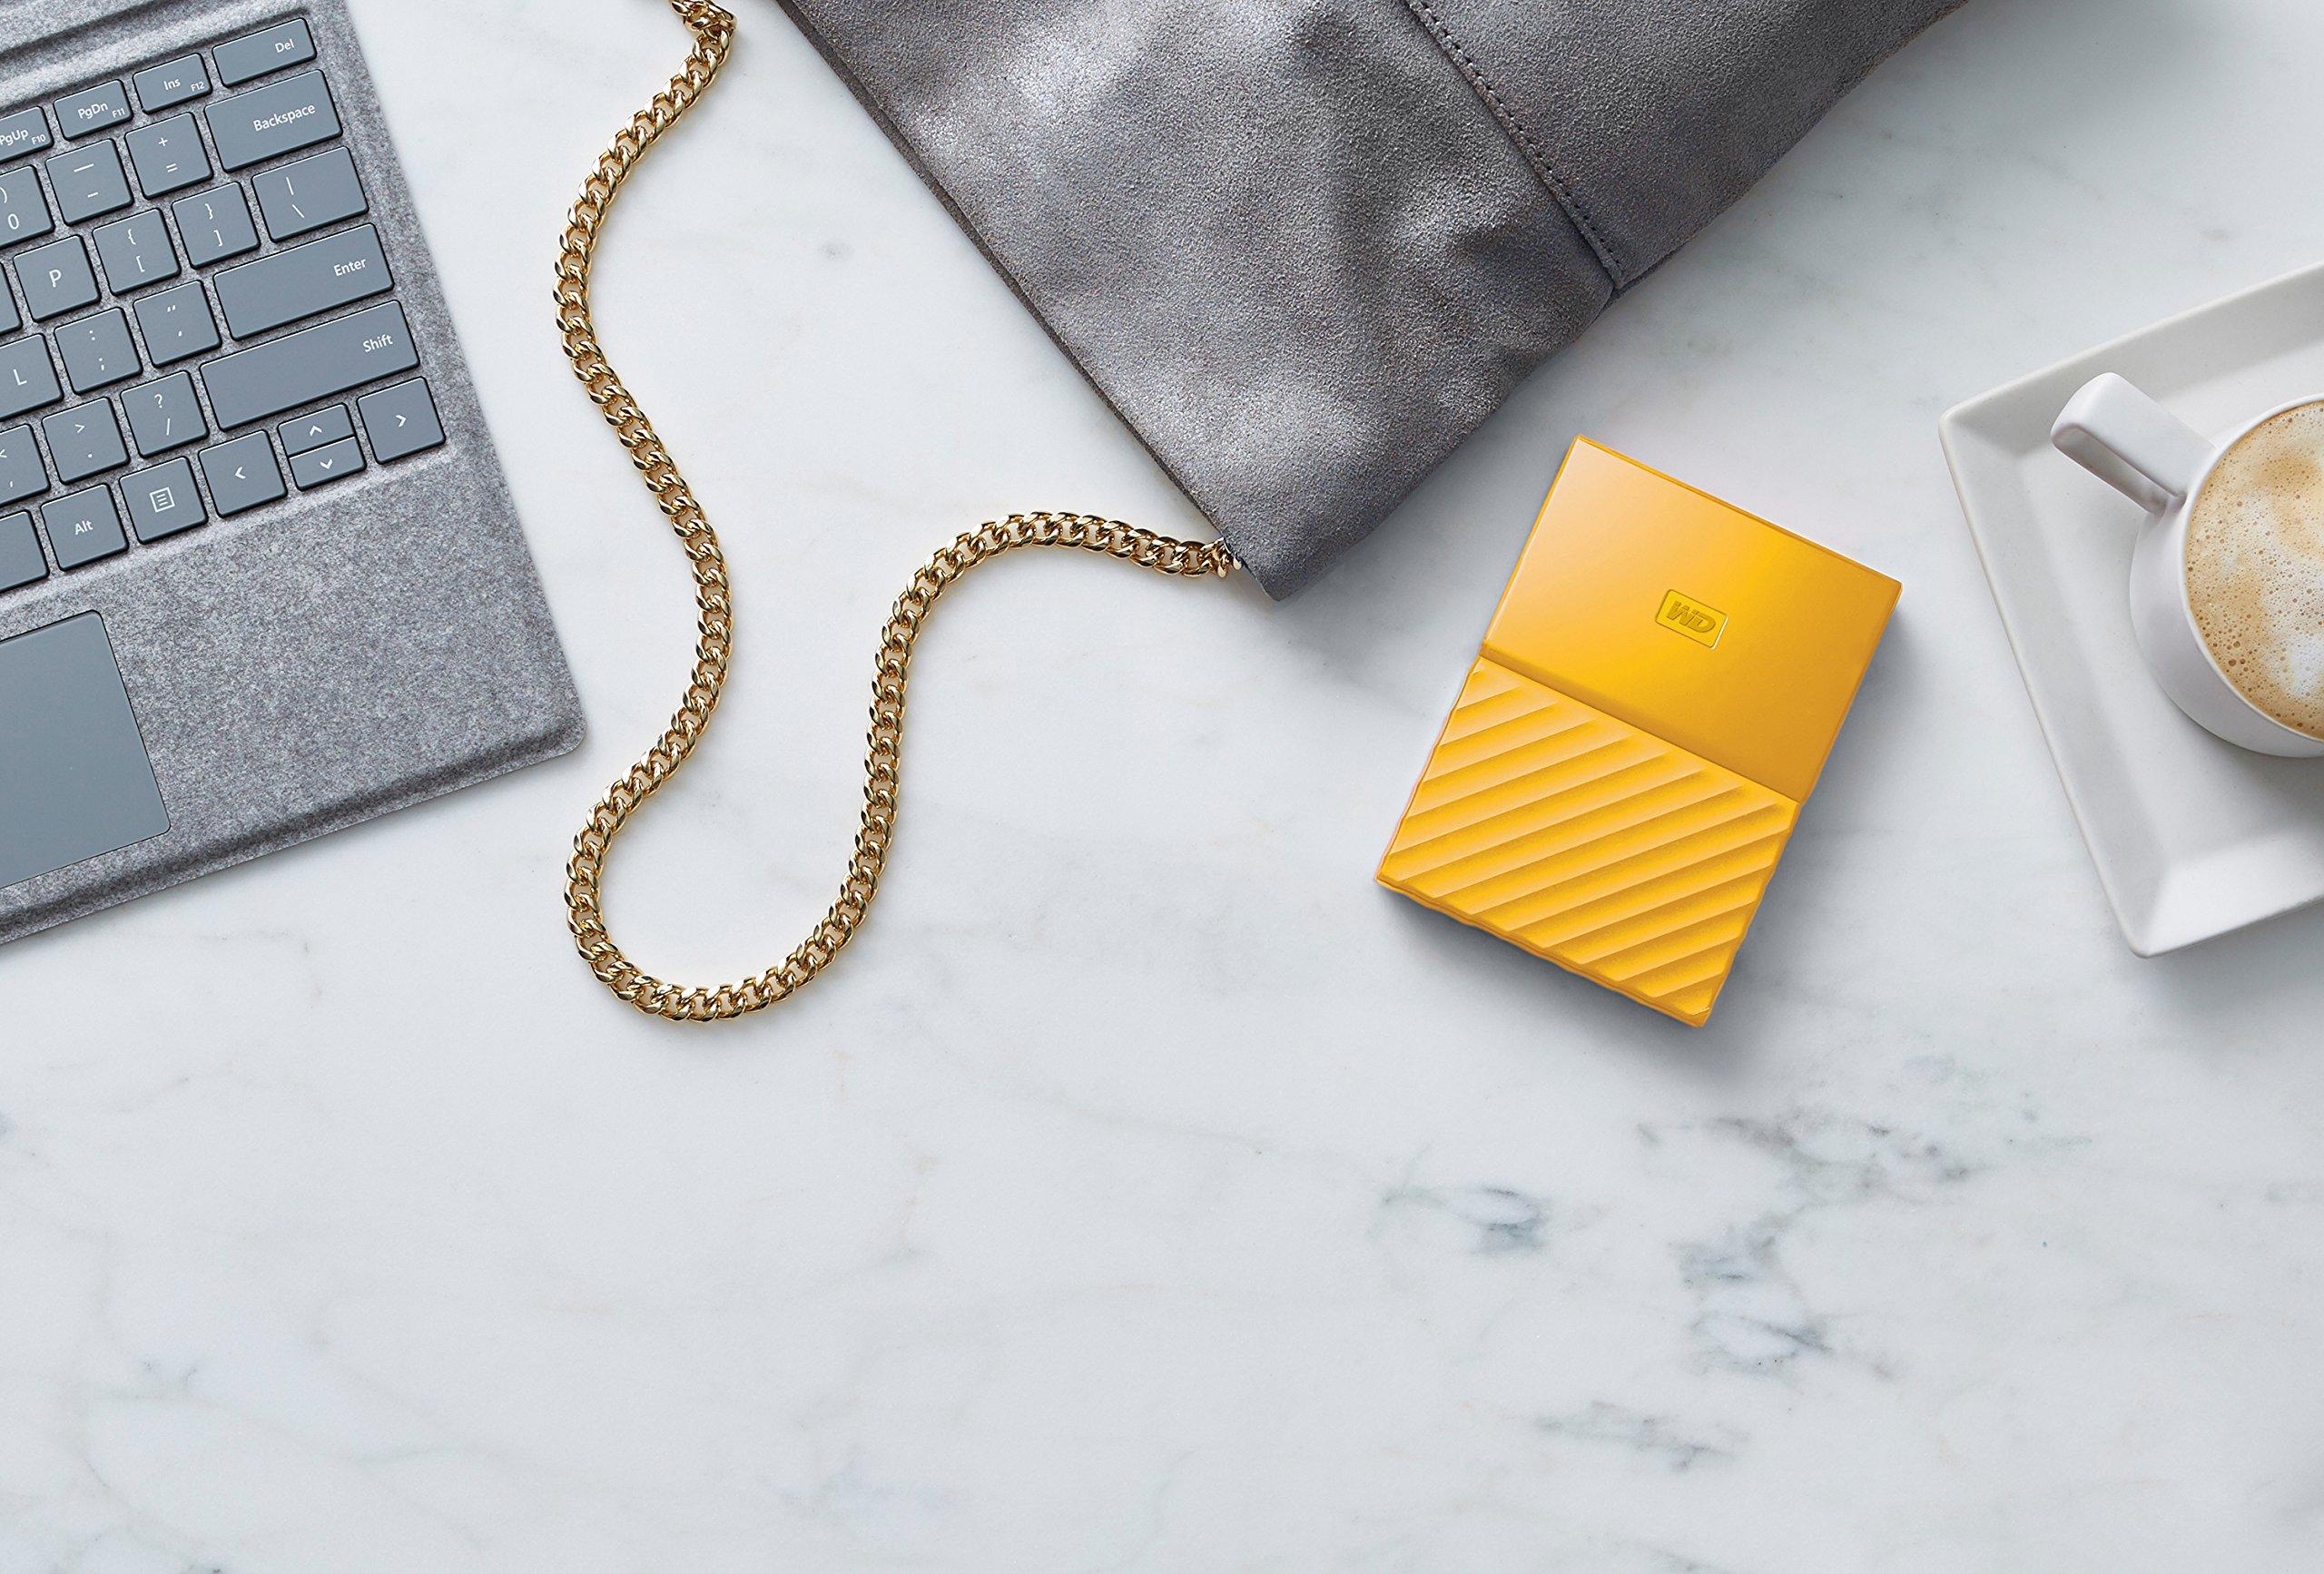 WD 2TB Yellow My Passport Portable External Hard Drive - USB 3.0 - WDBYFT0020BYL-WESN by Western Digital (Image #5)